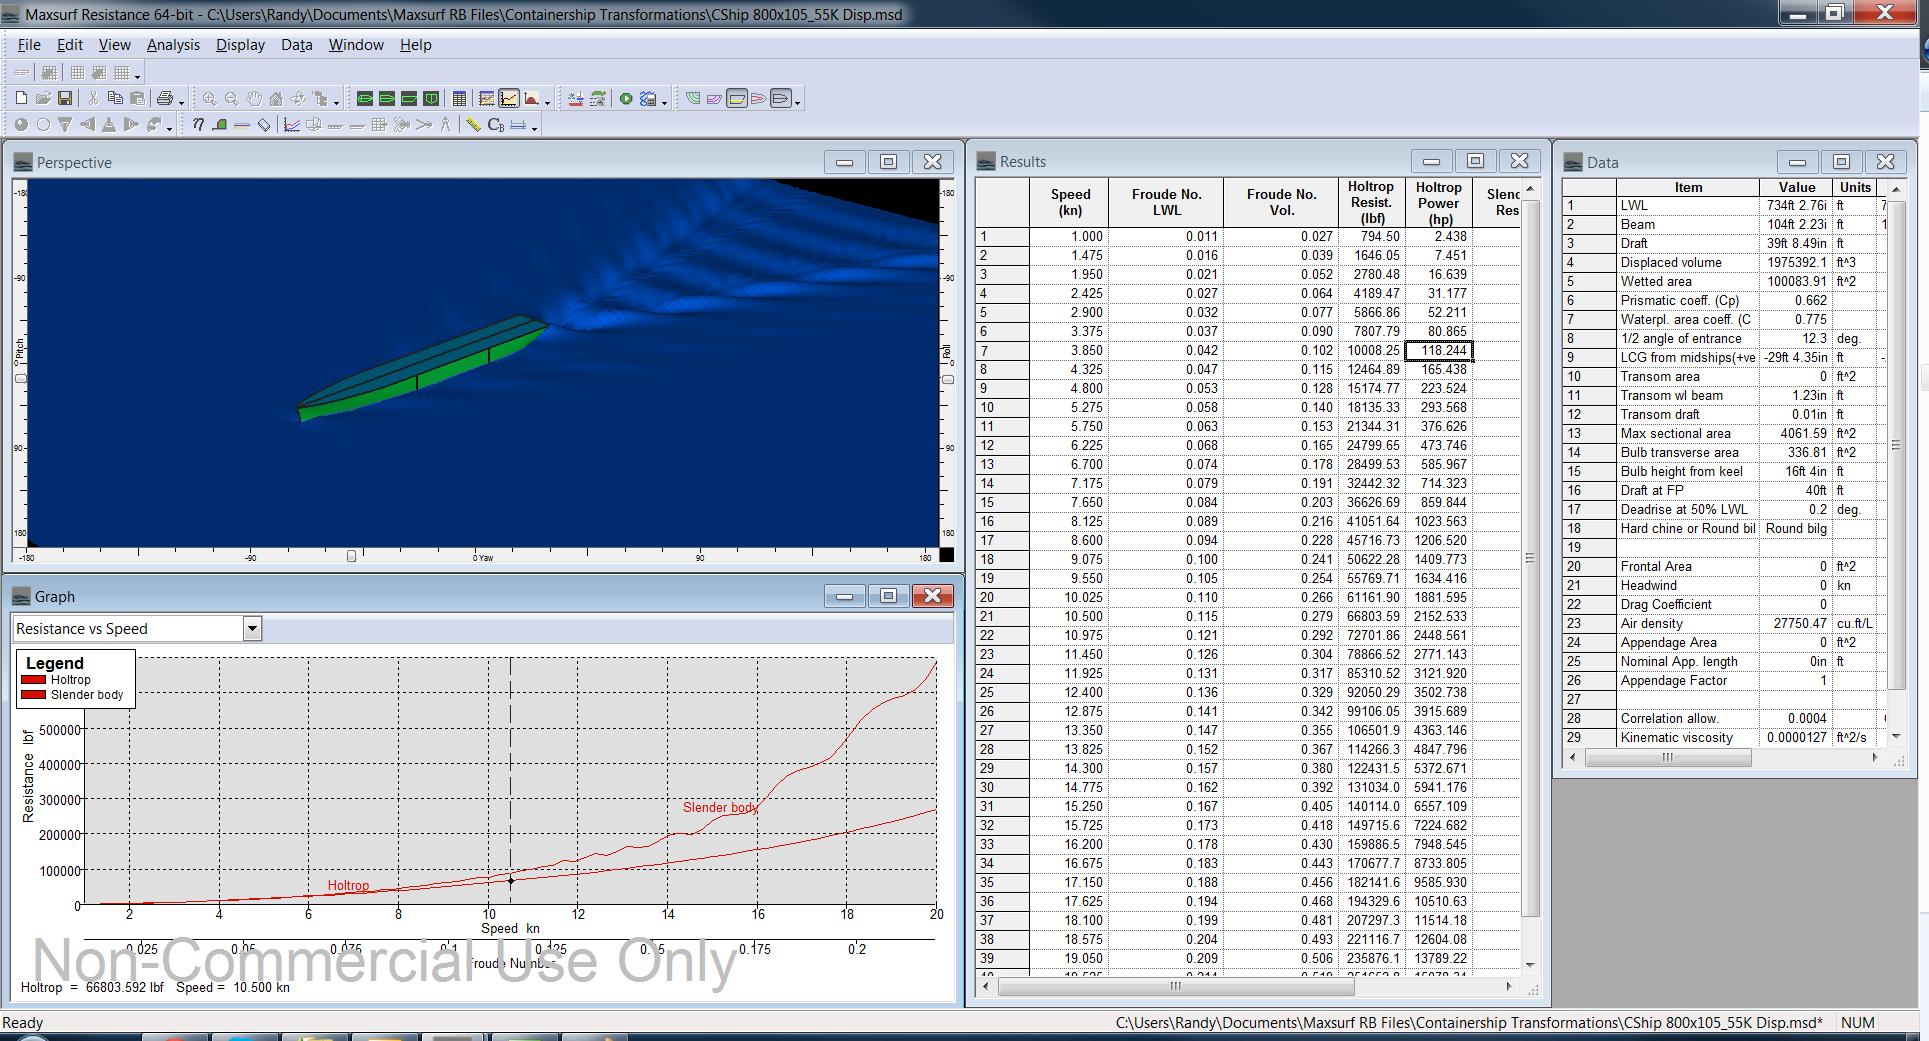 Maxsurf Resistance Screenshot 55K Containership